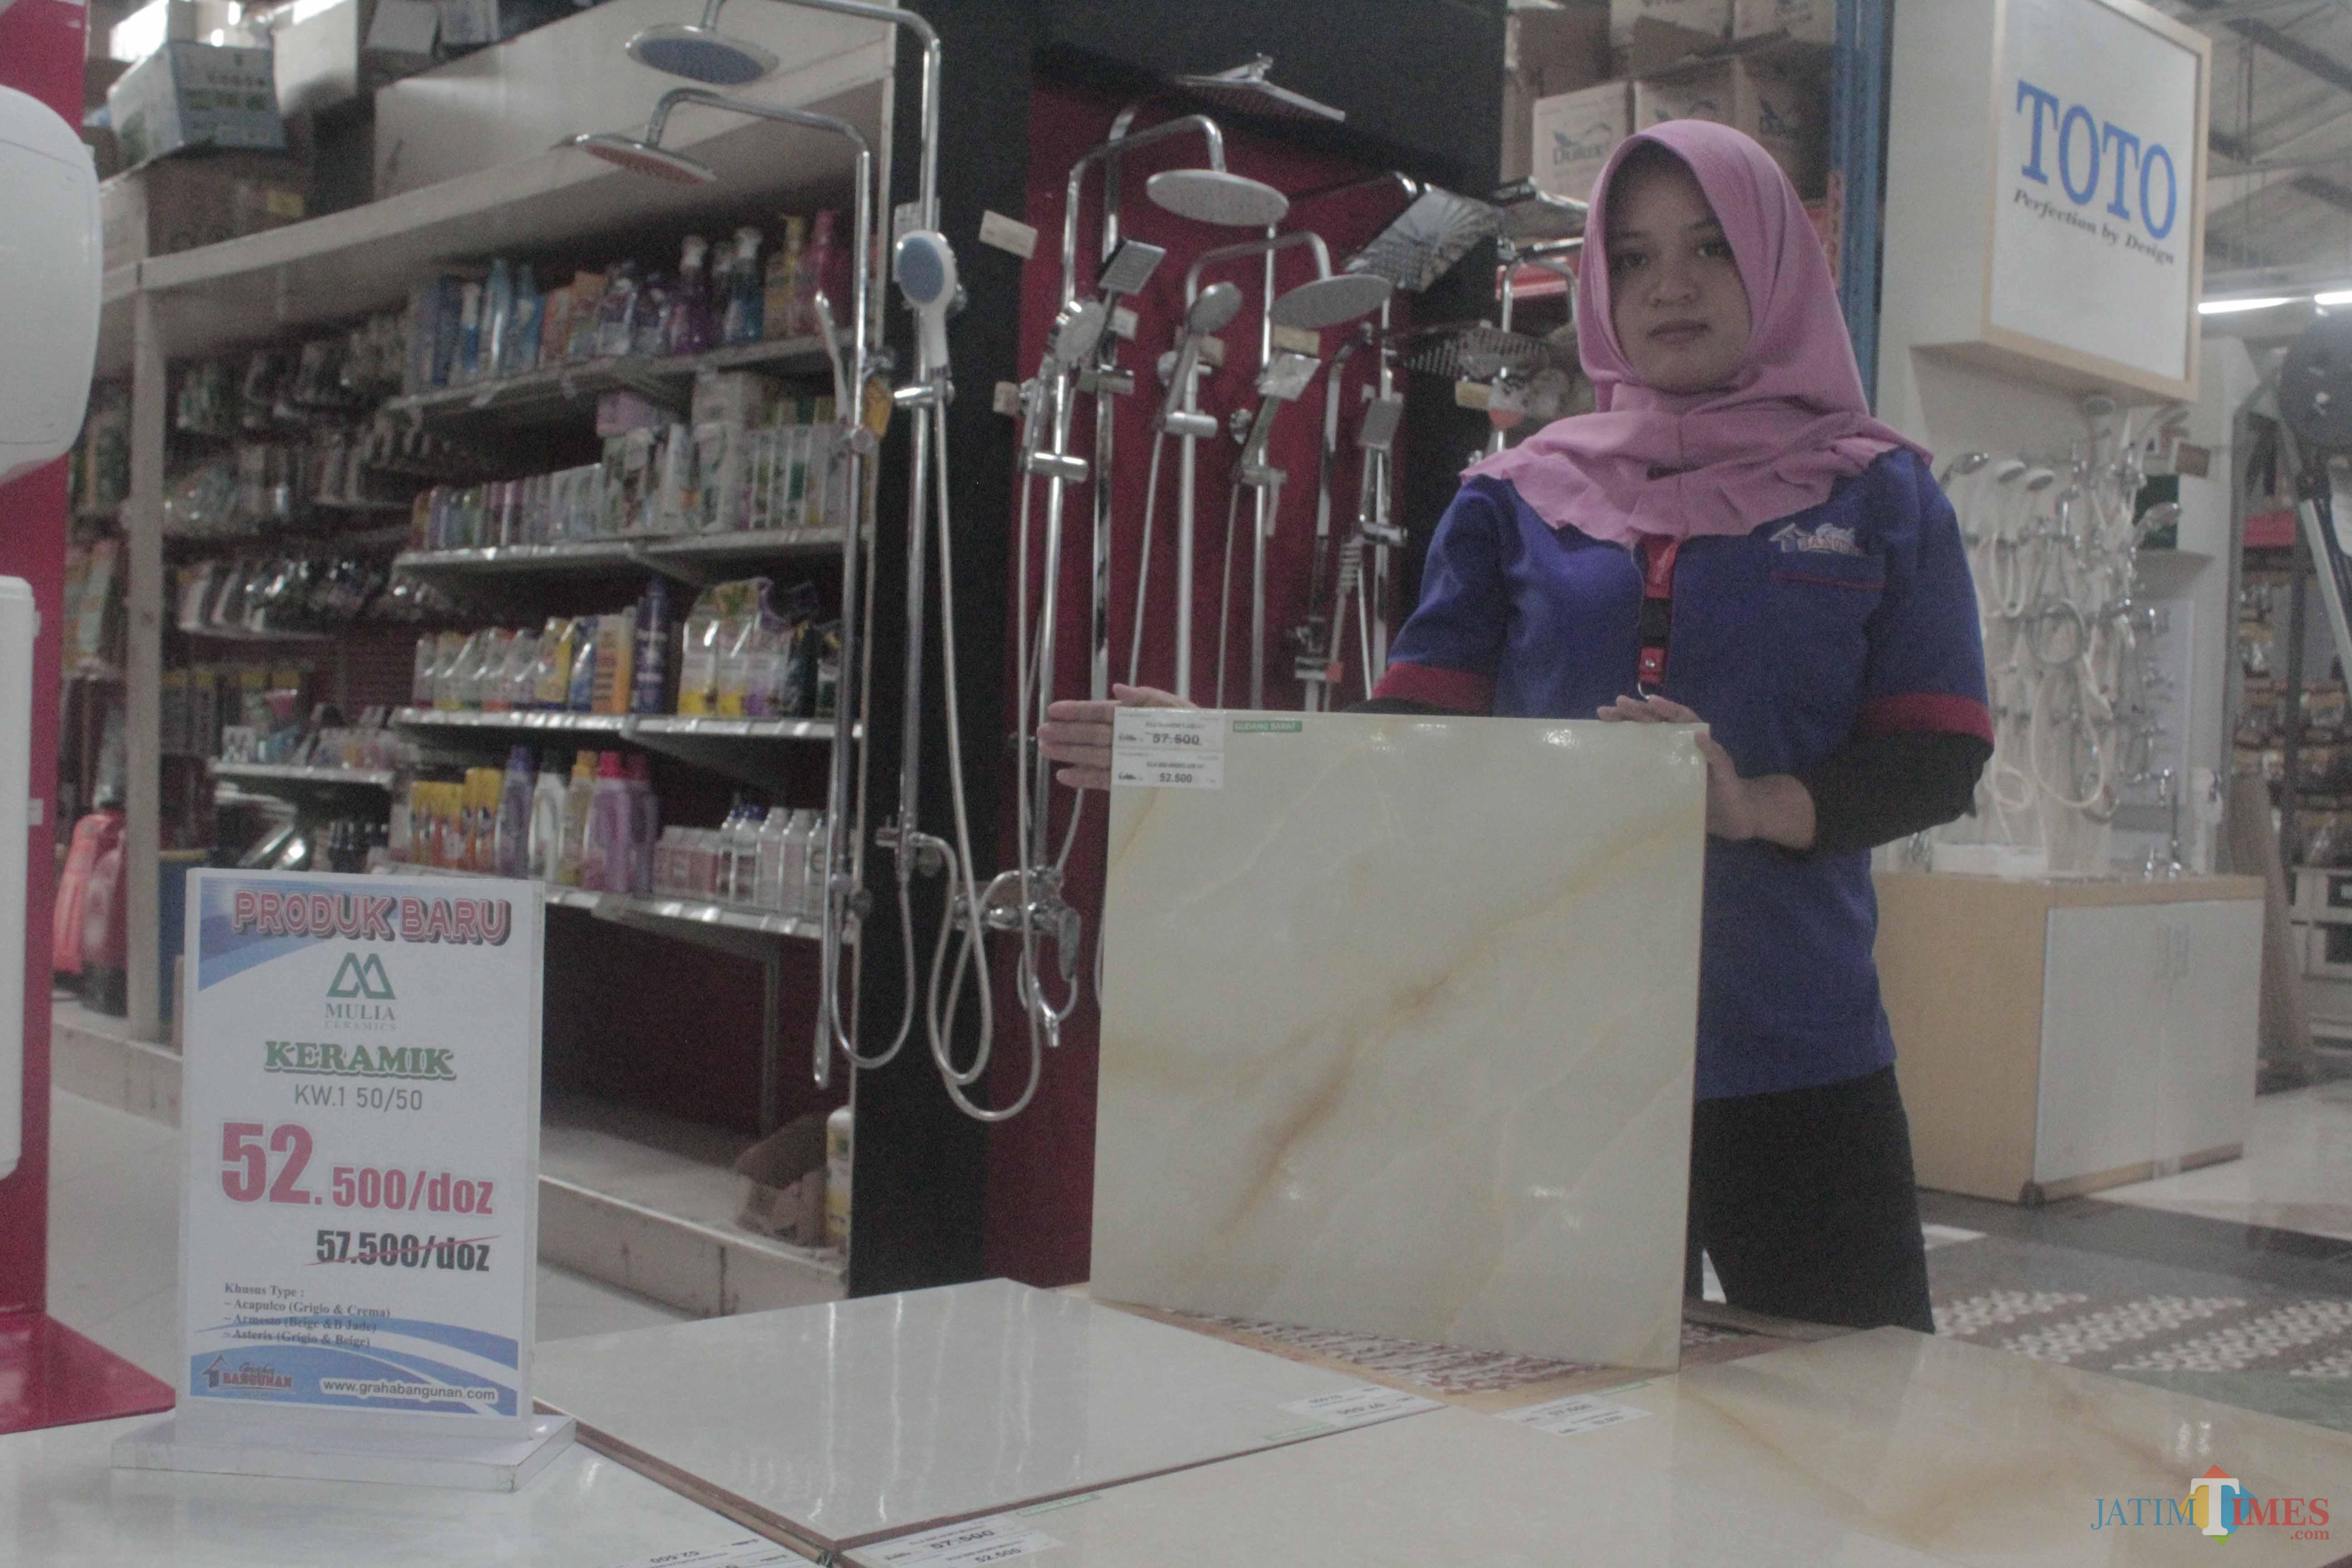 Karyawan menunjukkan keramik produk Mulia Ceramics yang lagi diskon.(Foto : Aunur Rofiq/BlitarTIMES)